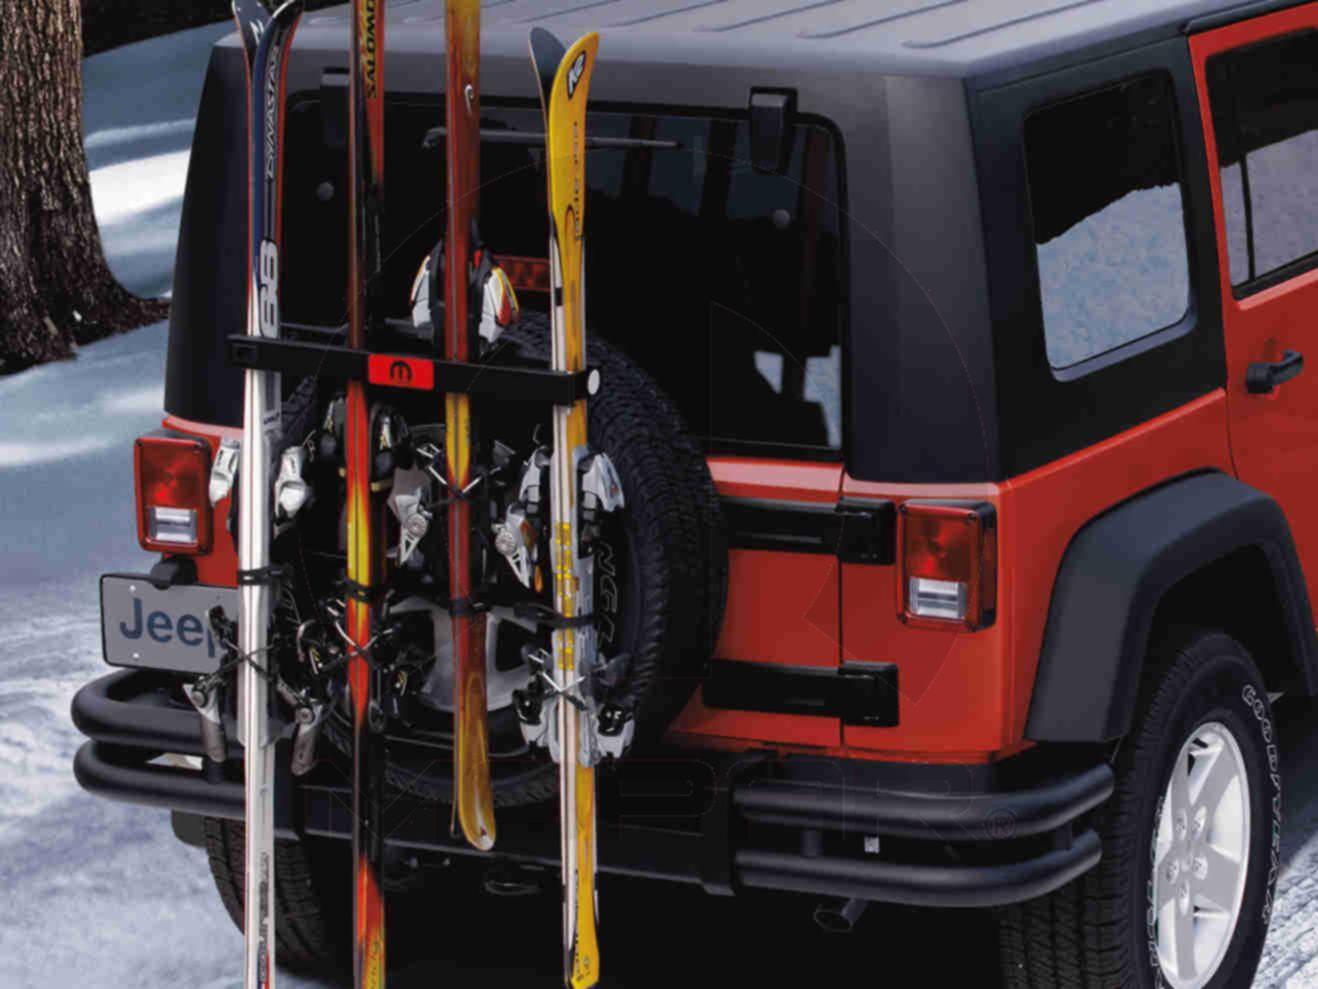 Ski Snowboard Carrier Spare Tire Mount Thsc9033 Mopar Jeep Wrangler Tj Spare Tire Mount Jeep Wrangler